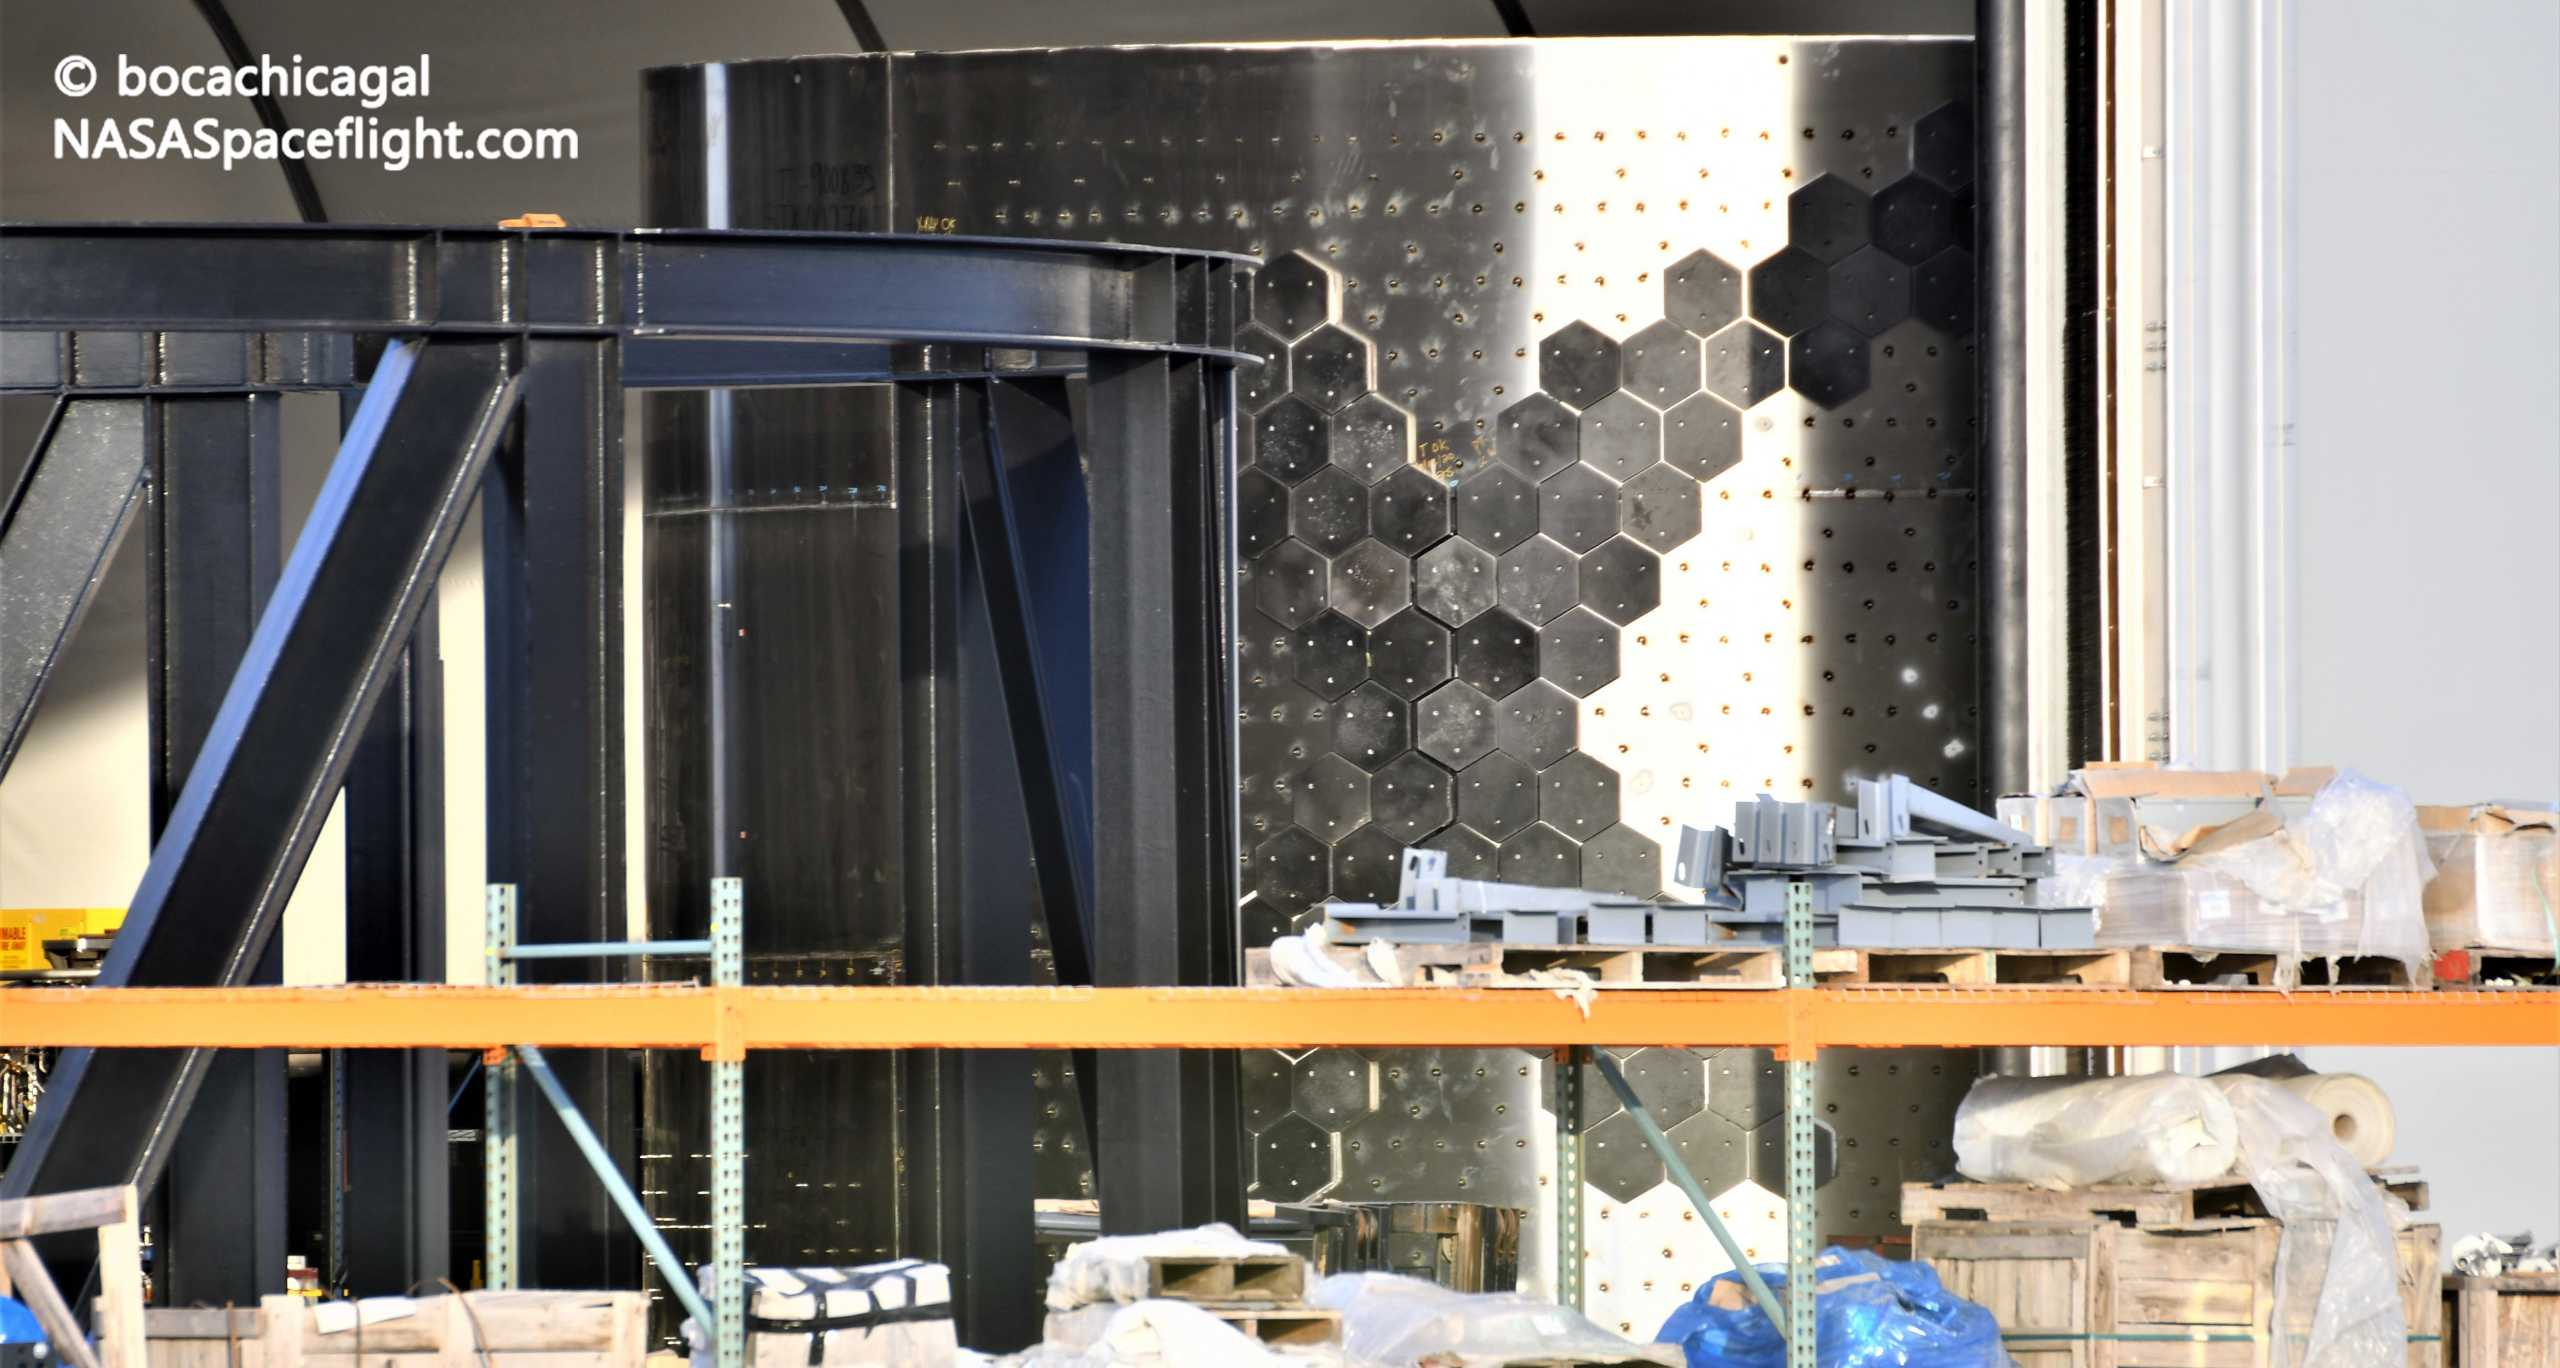 Starship Boca Chica 081020 (NASASpaceflight – bocachicagal) heat shield install 1 crop (c)